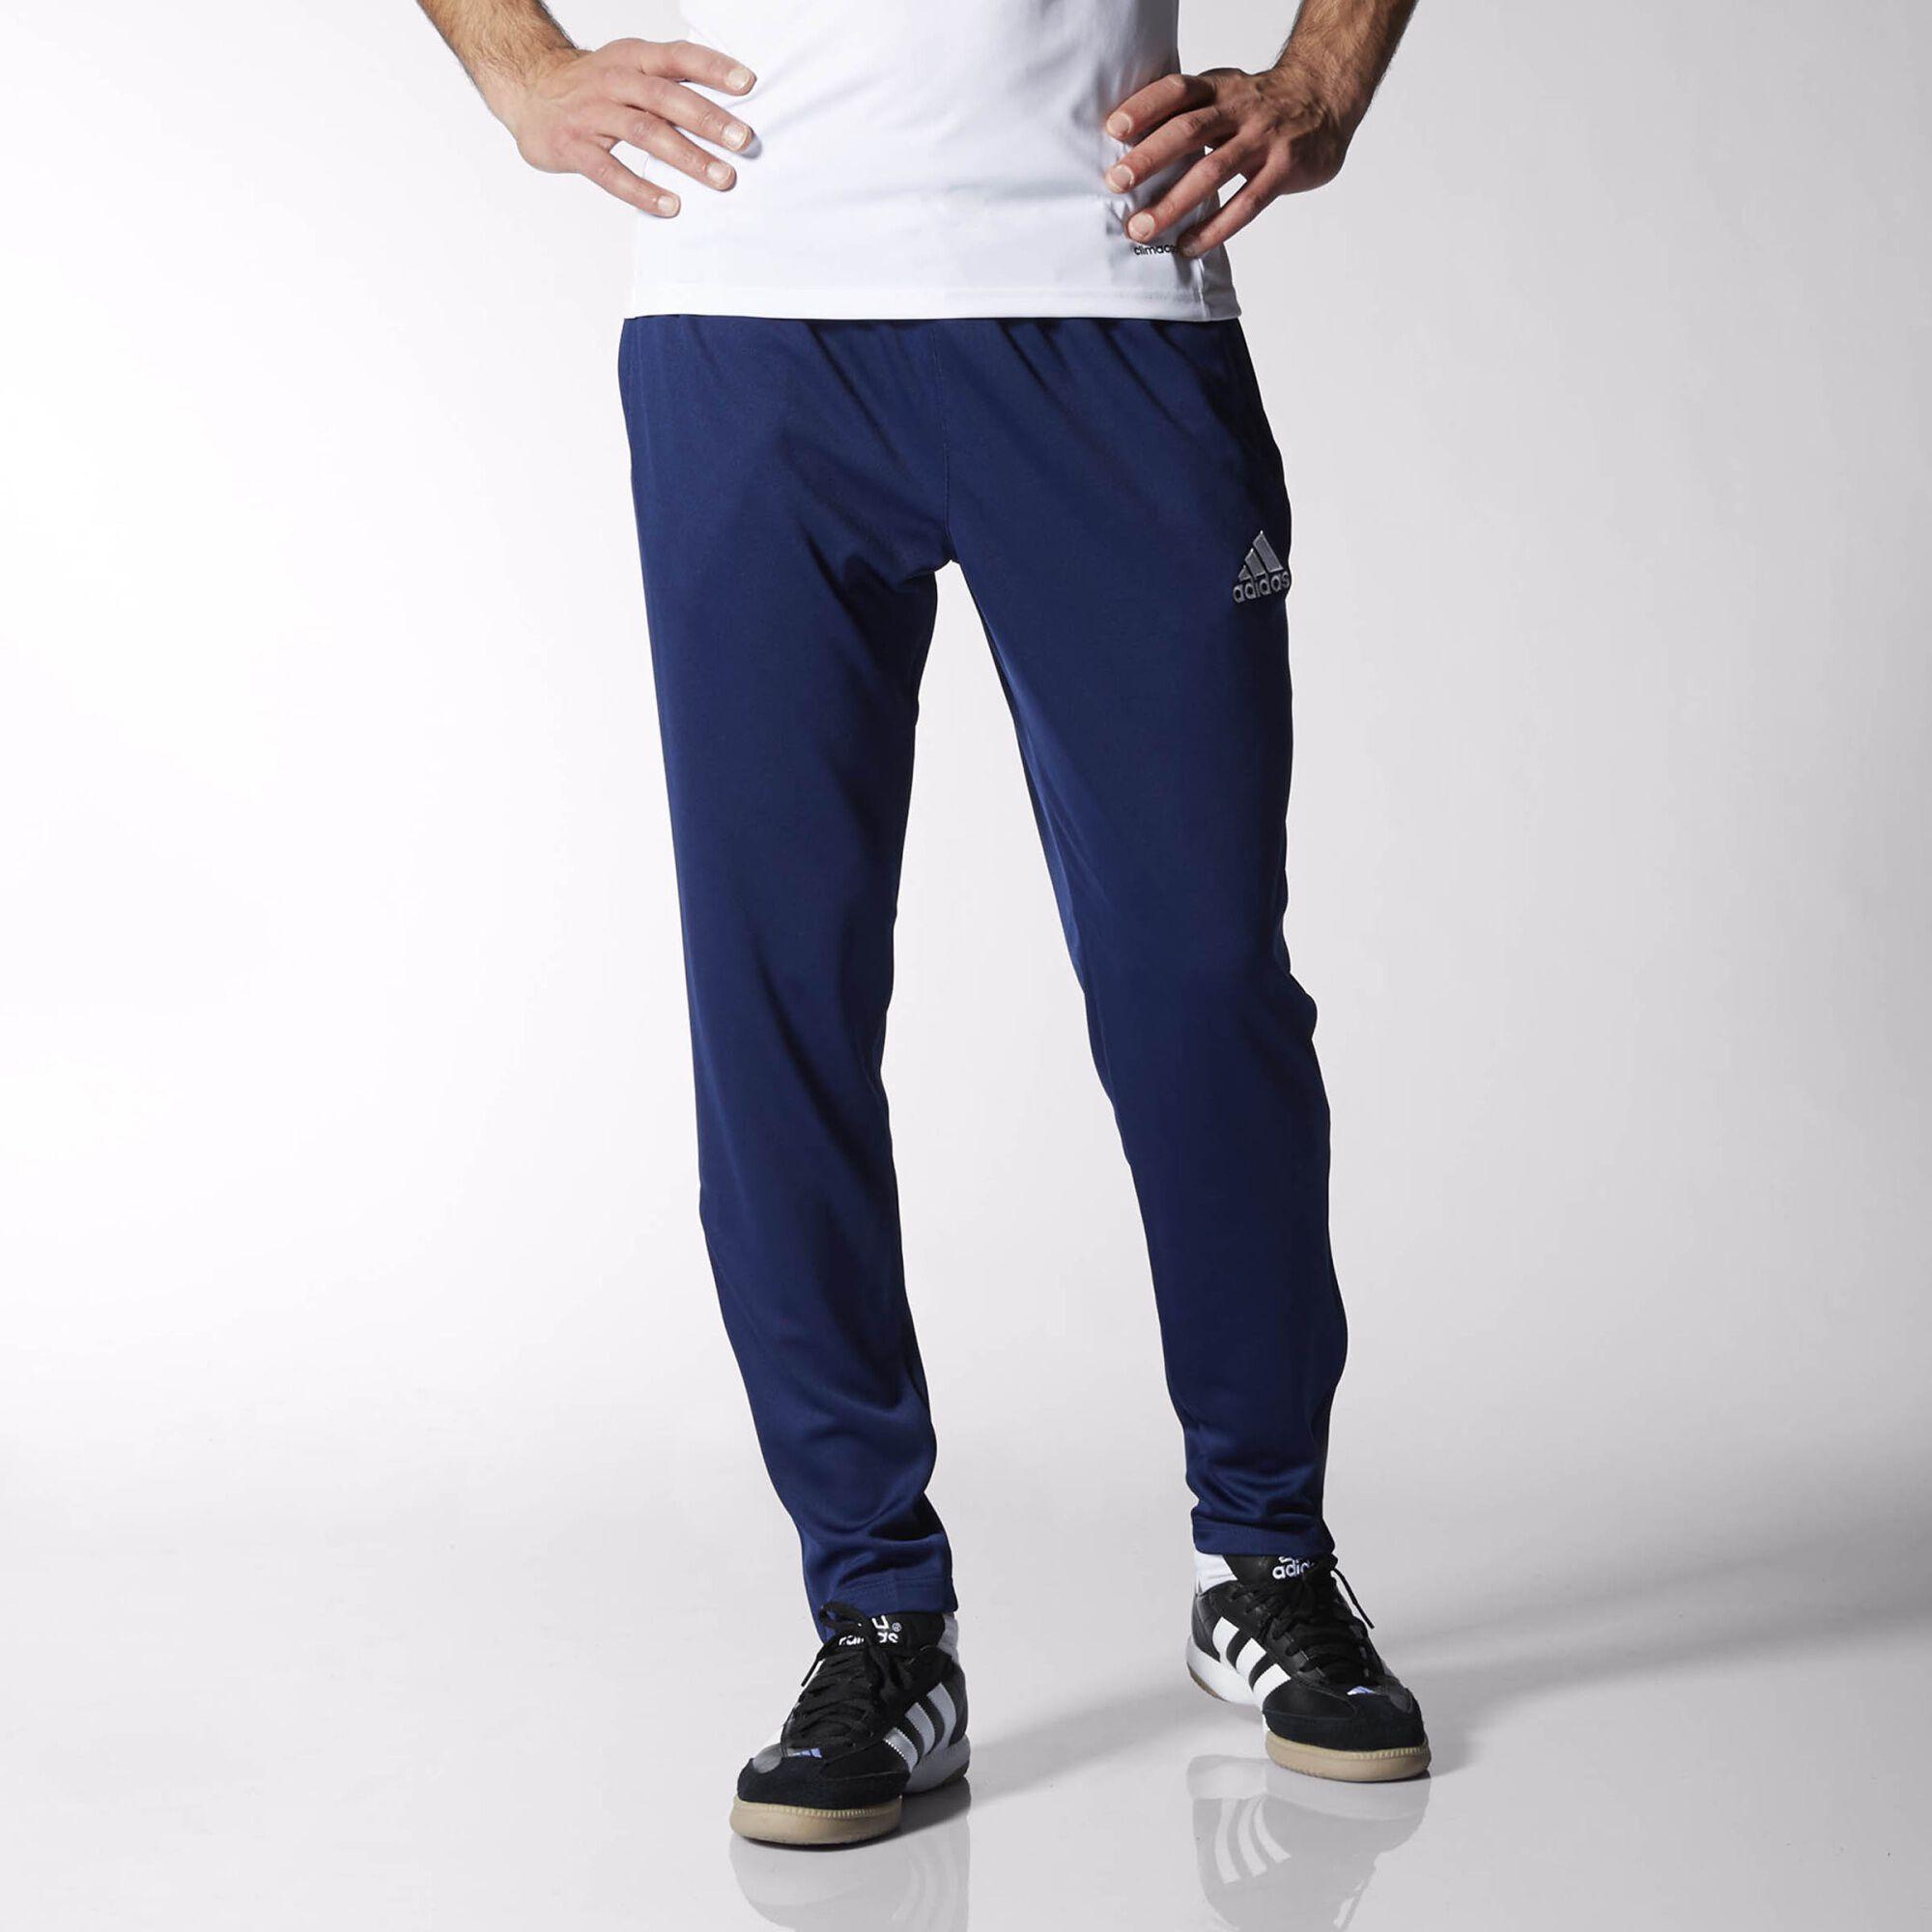 adidas slim fit soccer pants